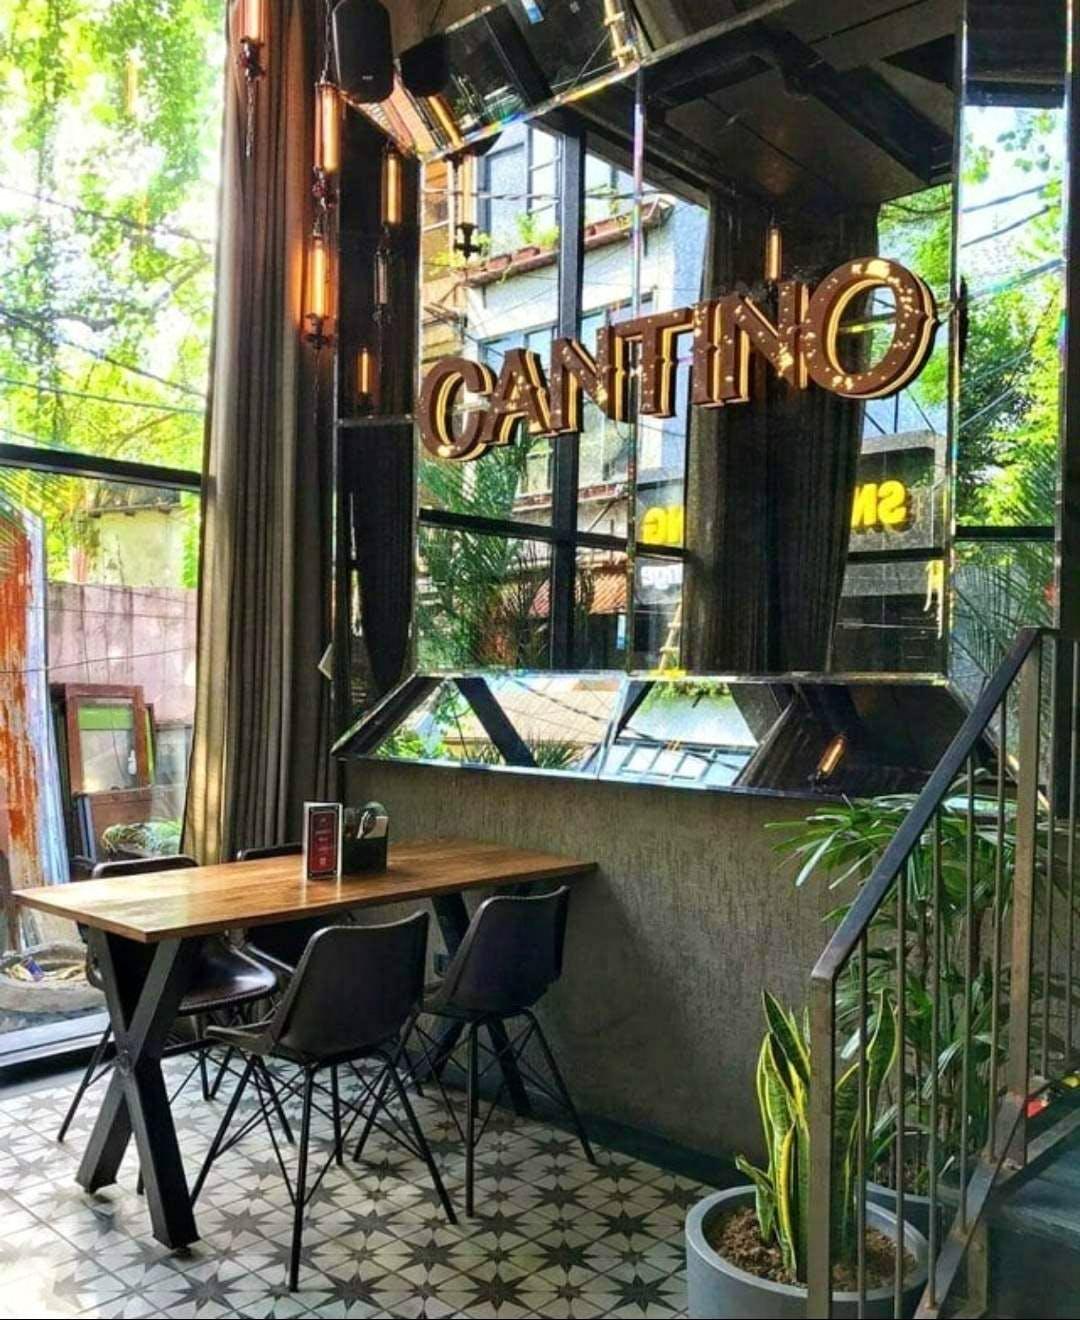 Building,Room,Restaurant,Coffeehouse,Table,Interior design,Café,Furniture,Plant,Porch